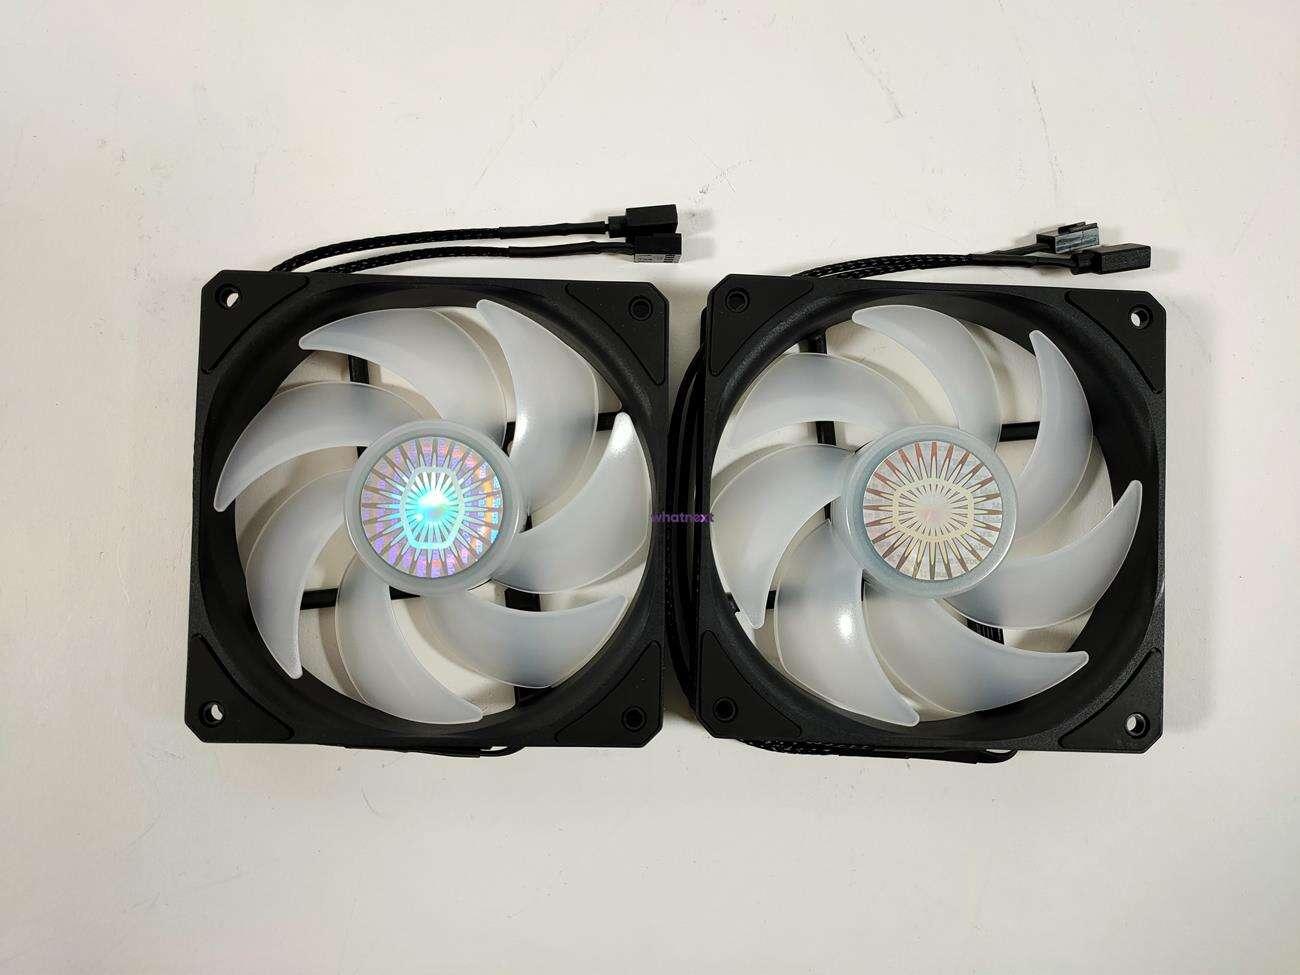 test Cooler Master MasterLiquid ML240L V2 RGB, recenzja Cooler Master MasterLiquid ML240L V2 RGB, opinia Cooler Master MasterLiquid ML240L V2 RGB